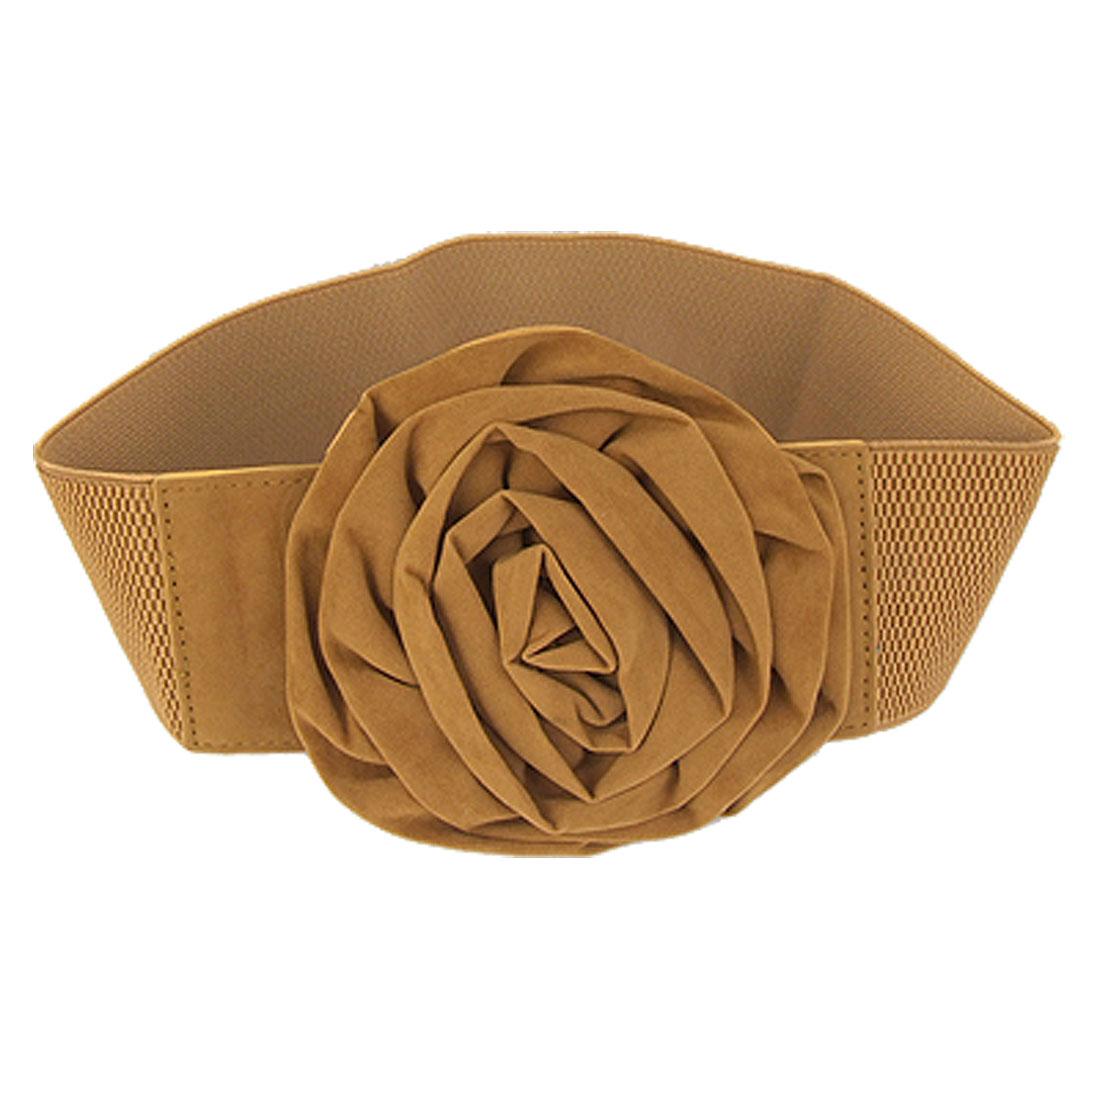 Flannel Rose Decor Interlock Closure Elastic Brown Waist Belt for Lady